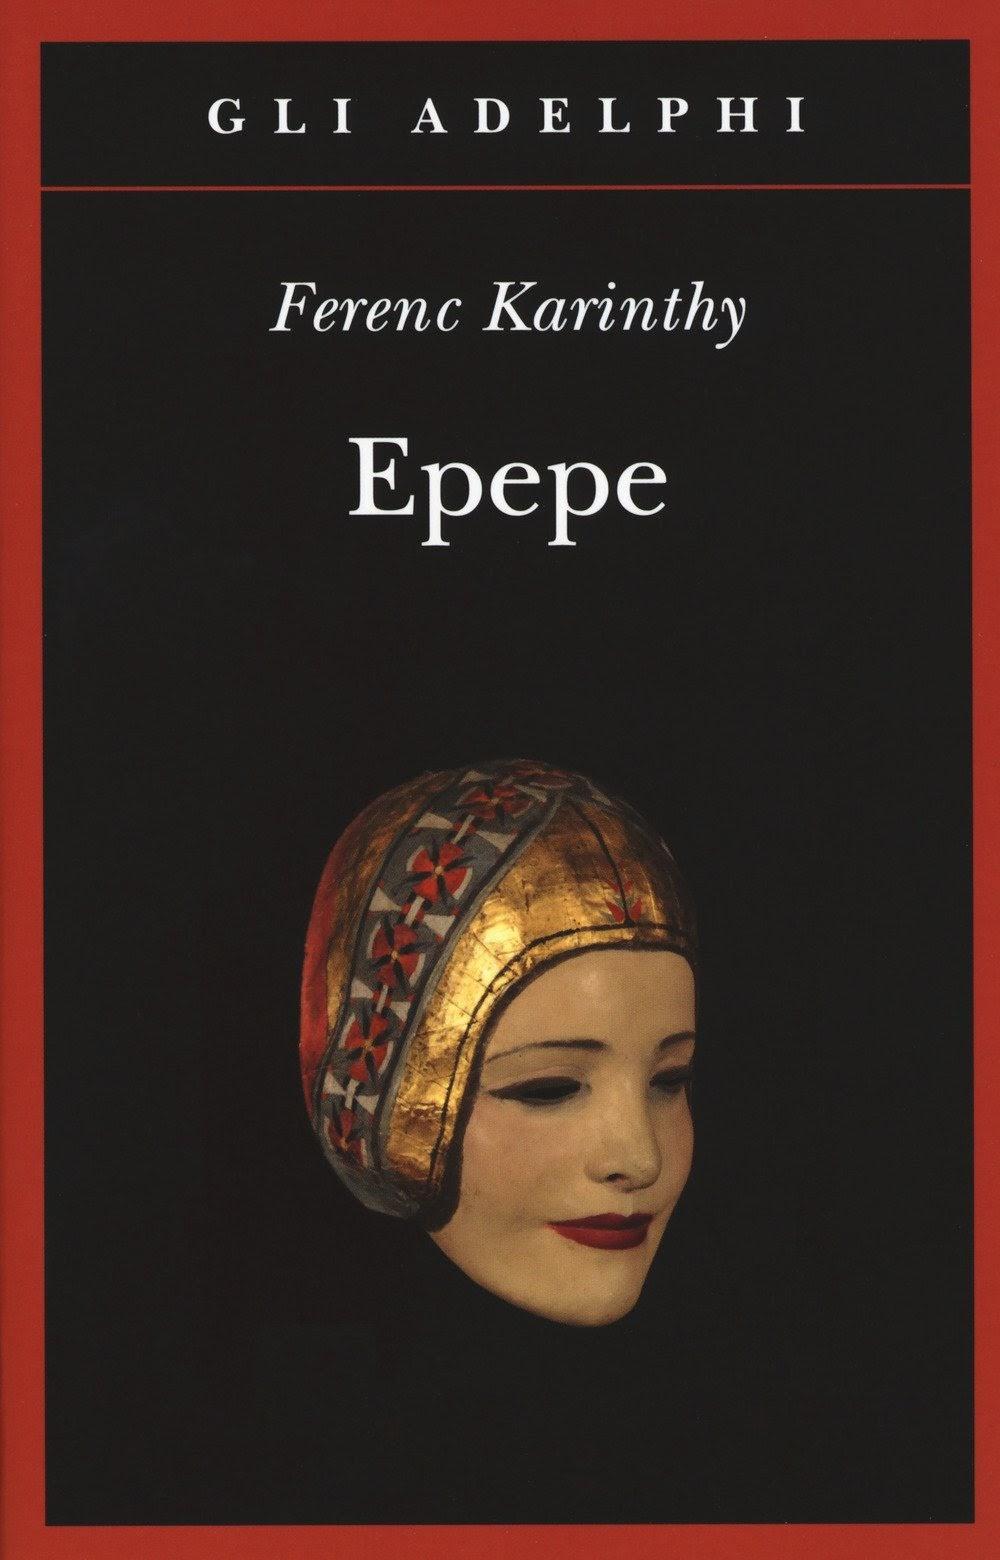 Epepe di Ferenc Karinthy